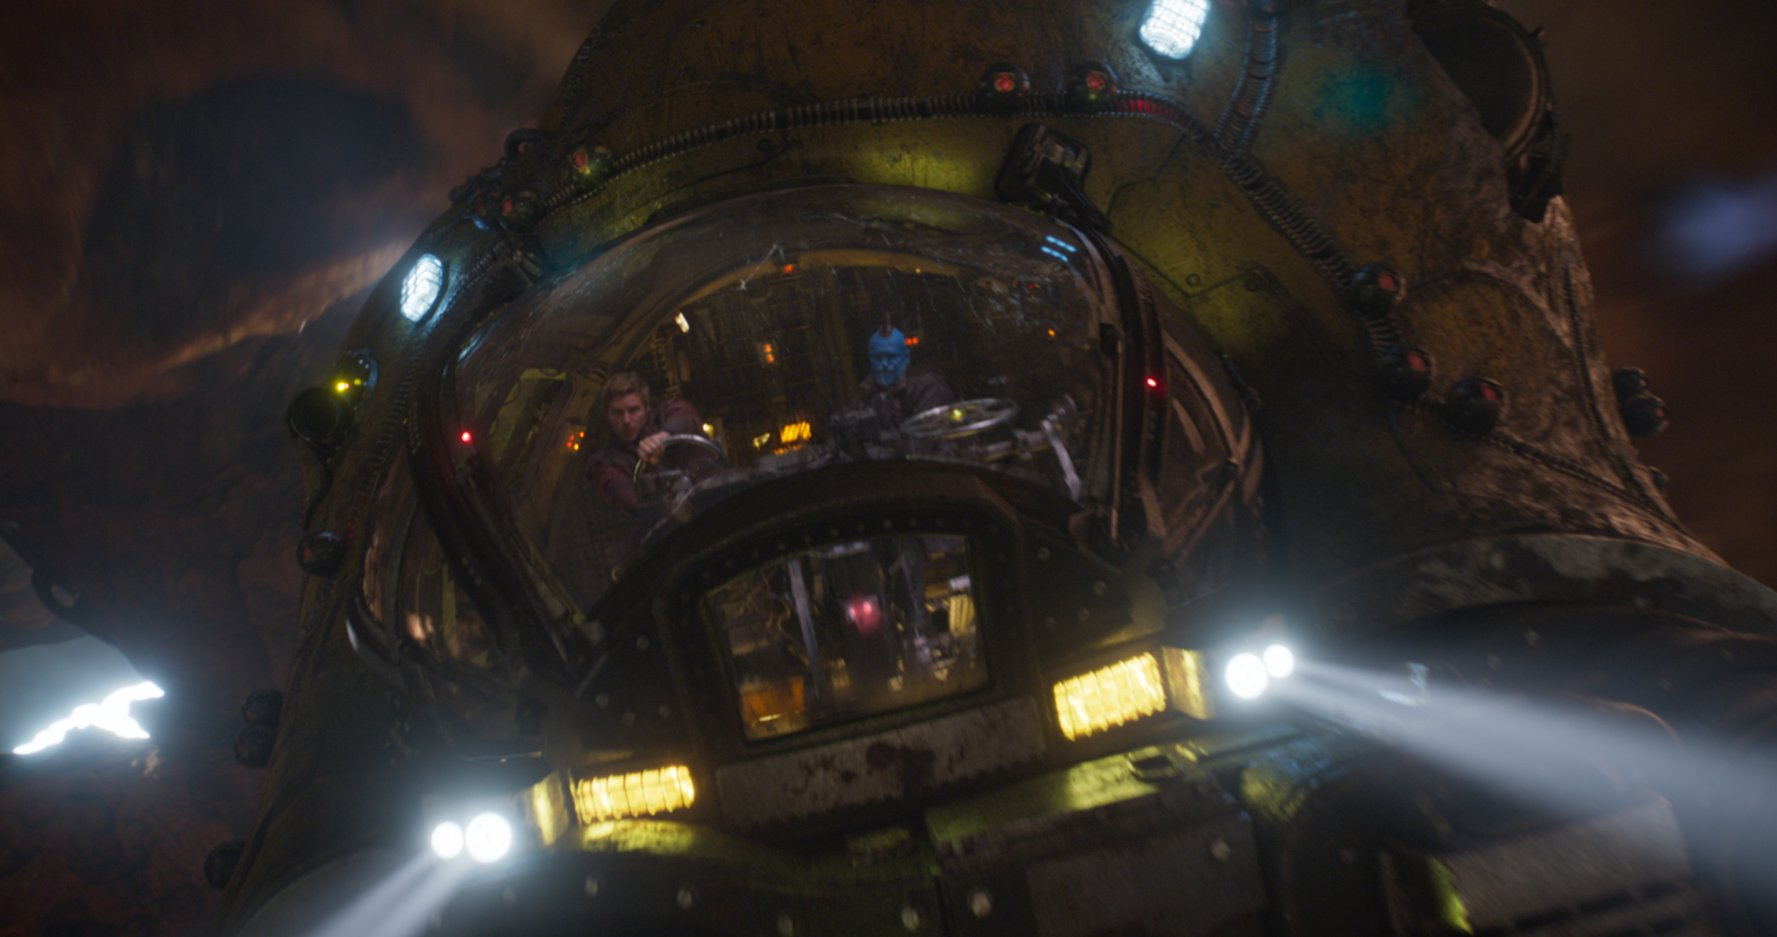 Strażnicy Galaktyki 2 - napisy